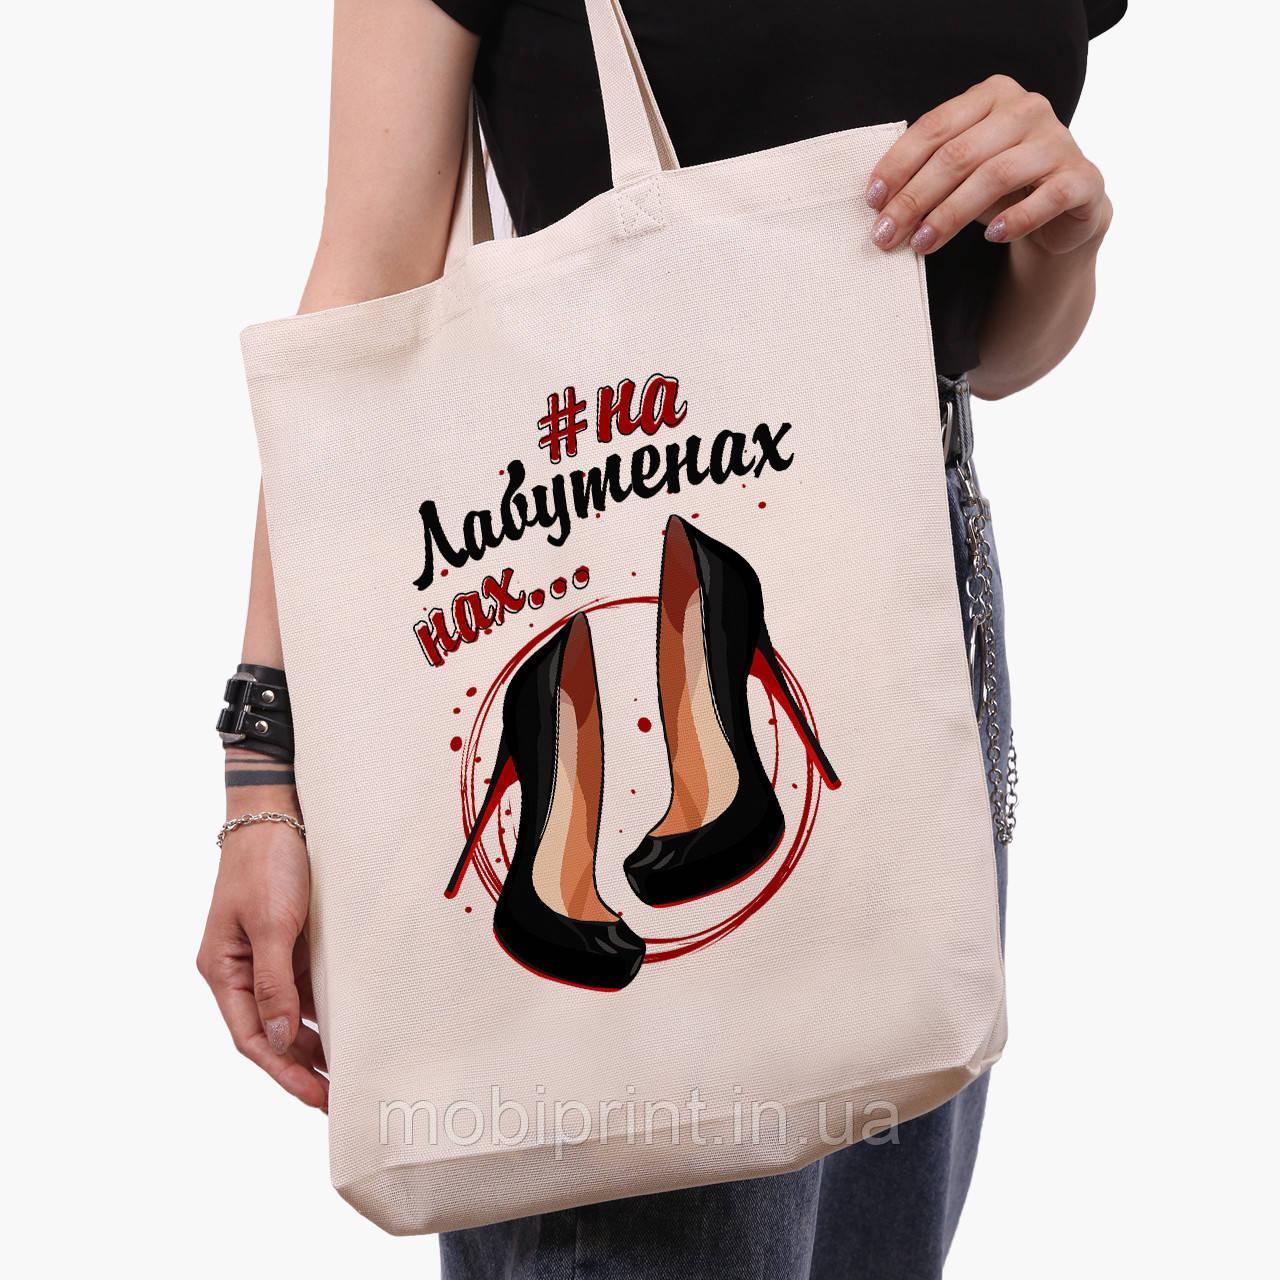 Эко сумка шоппер белая На лабутенах (On Louboutins) (9227-1259-1)  экосумка шопер 41*39*8 см